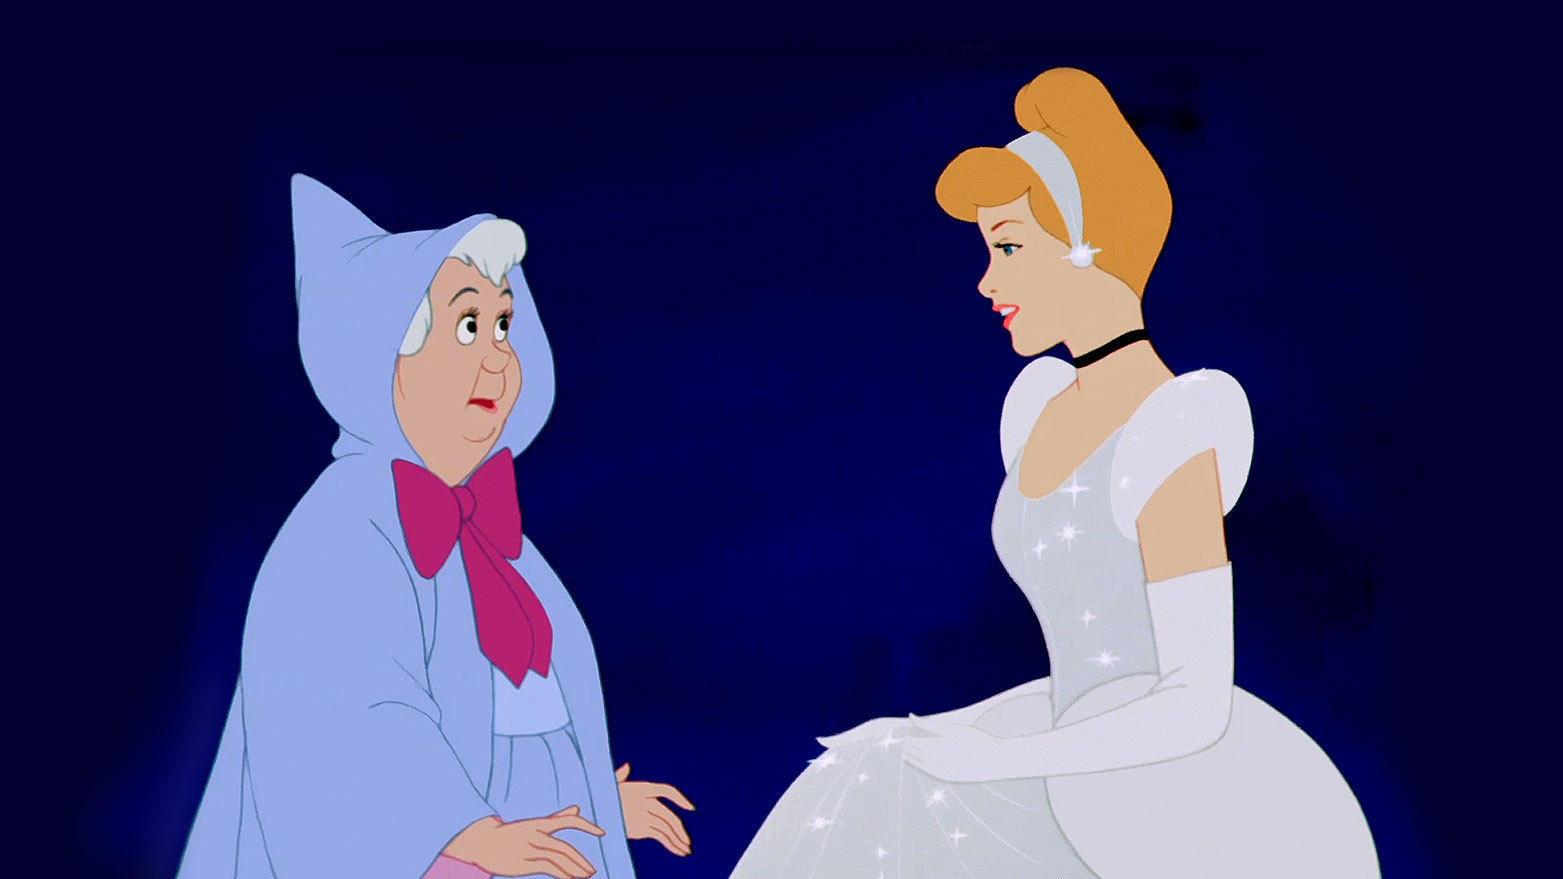 Ten modern Cinderellas who found their princes